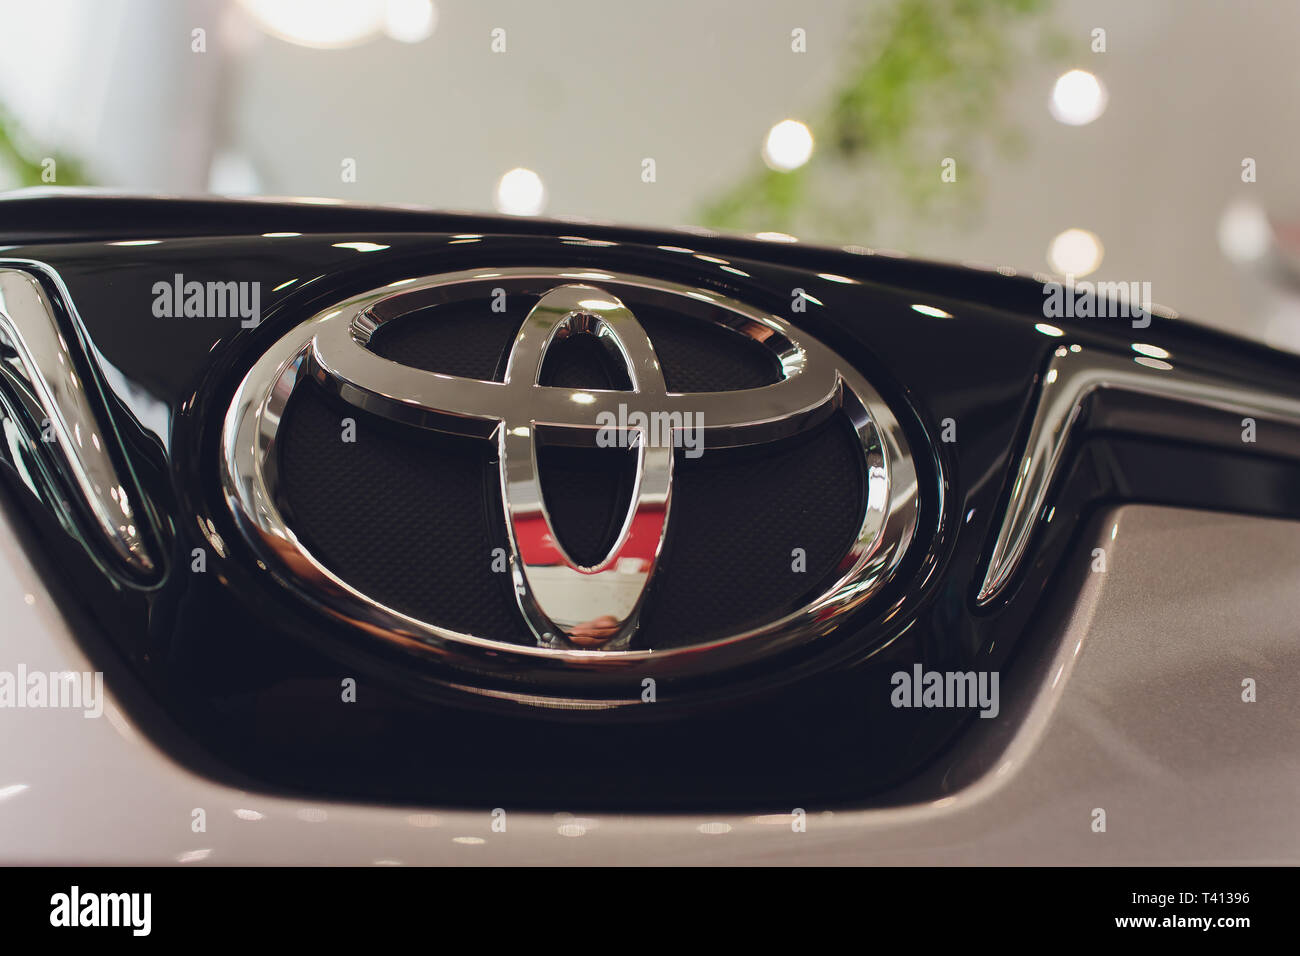 Ufa, Russia - 14 February 2019 All-new Toyota Corolla